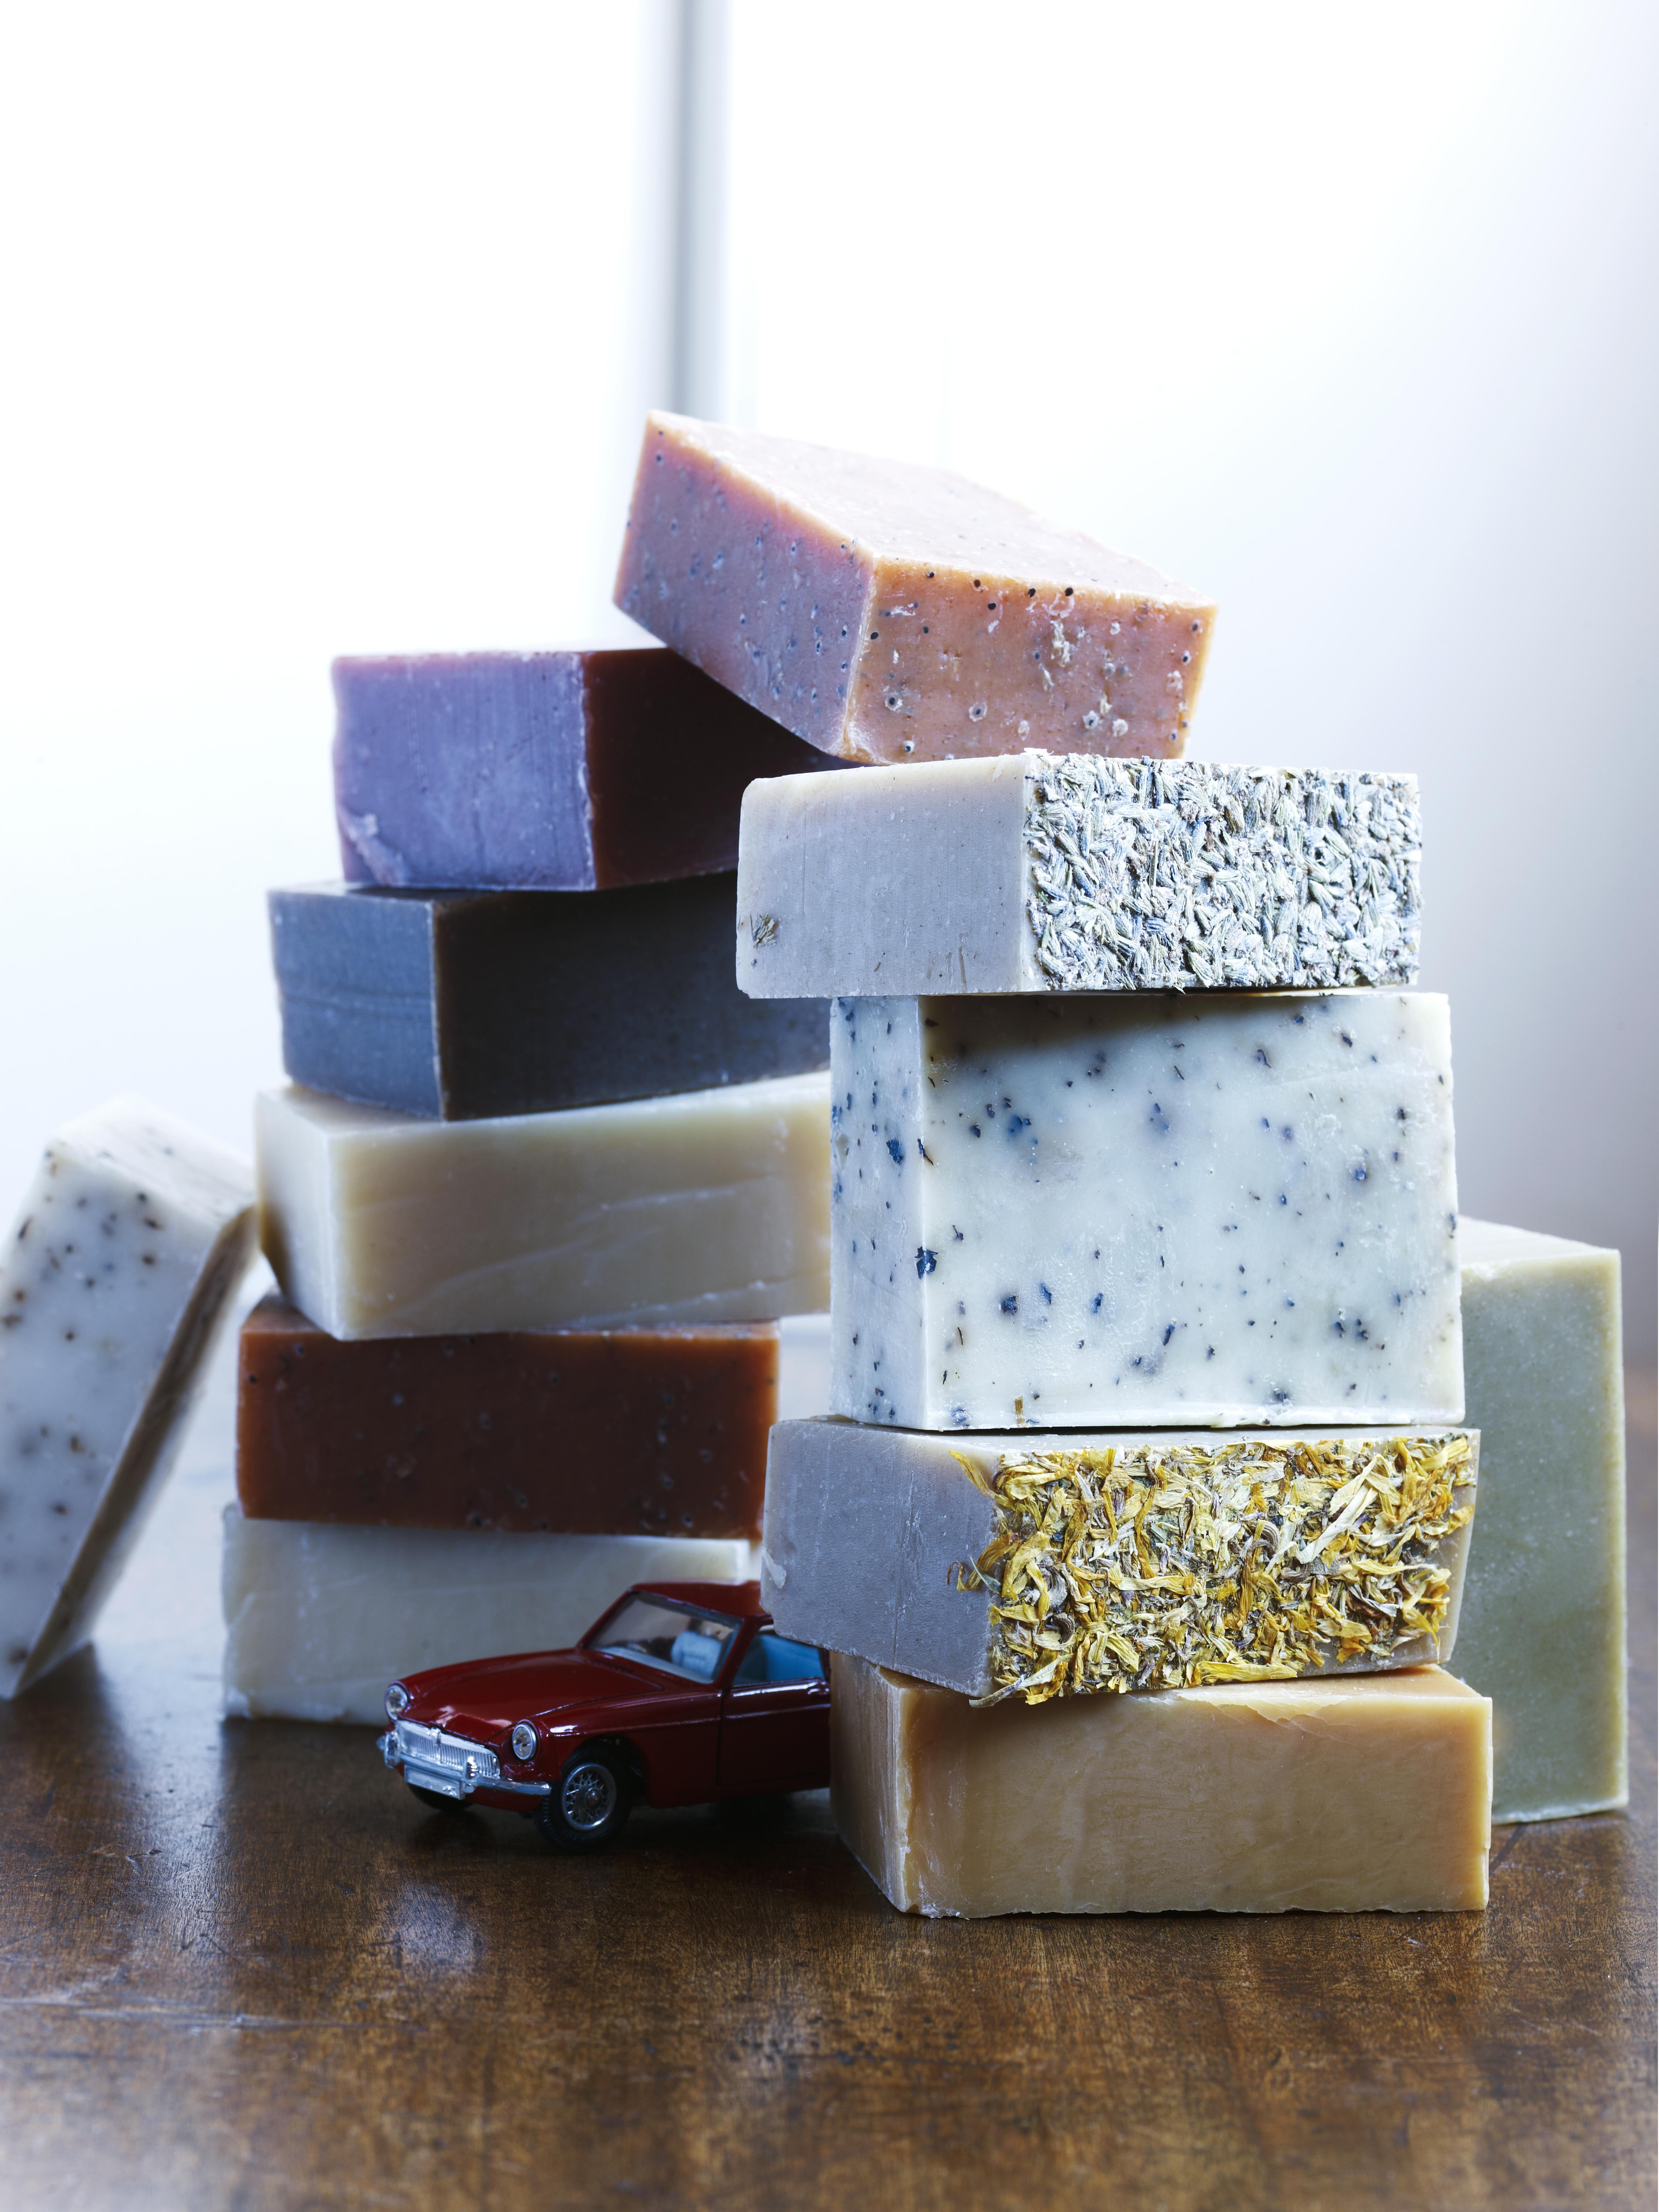 Soap Stack & Car